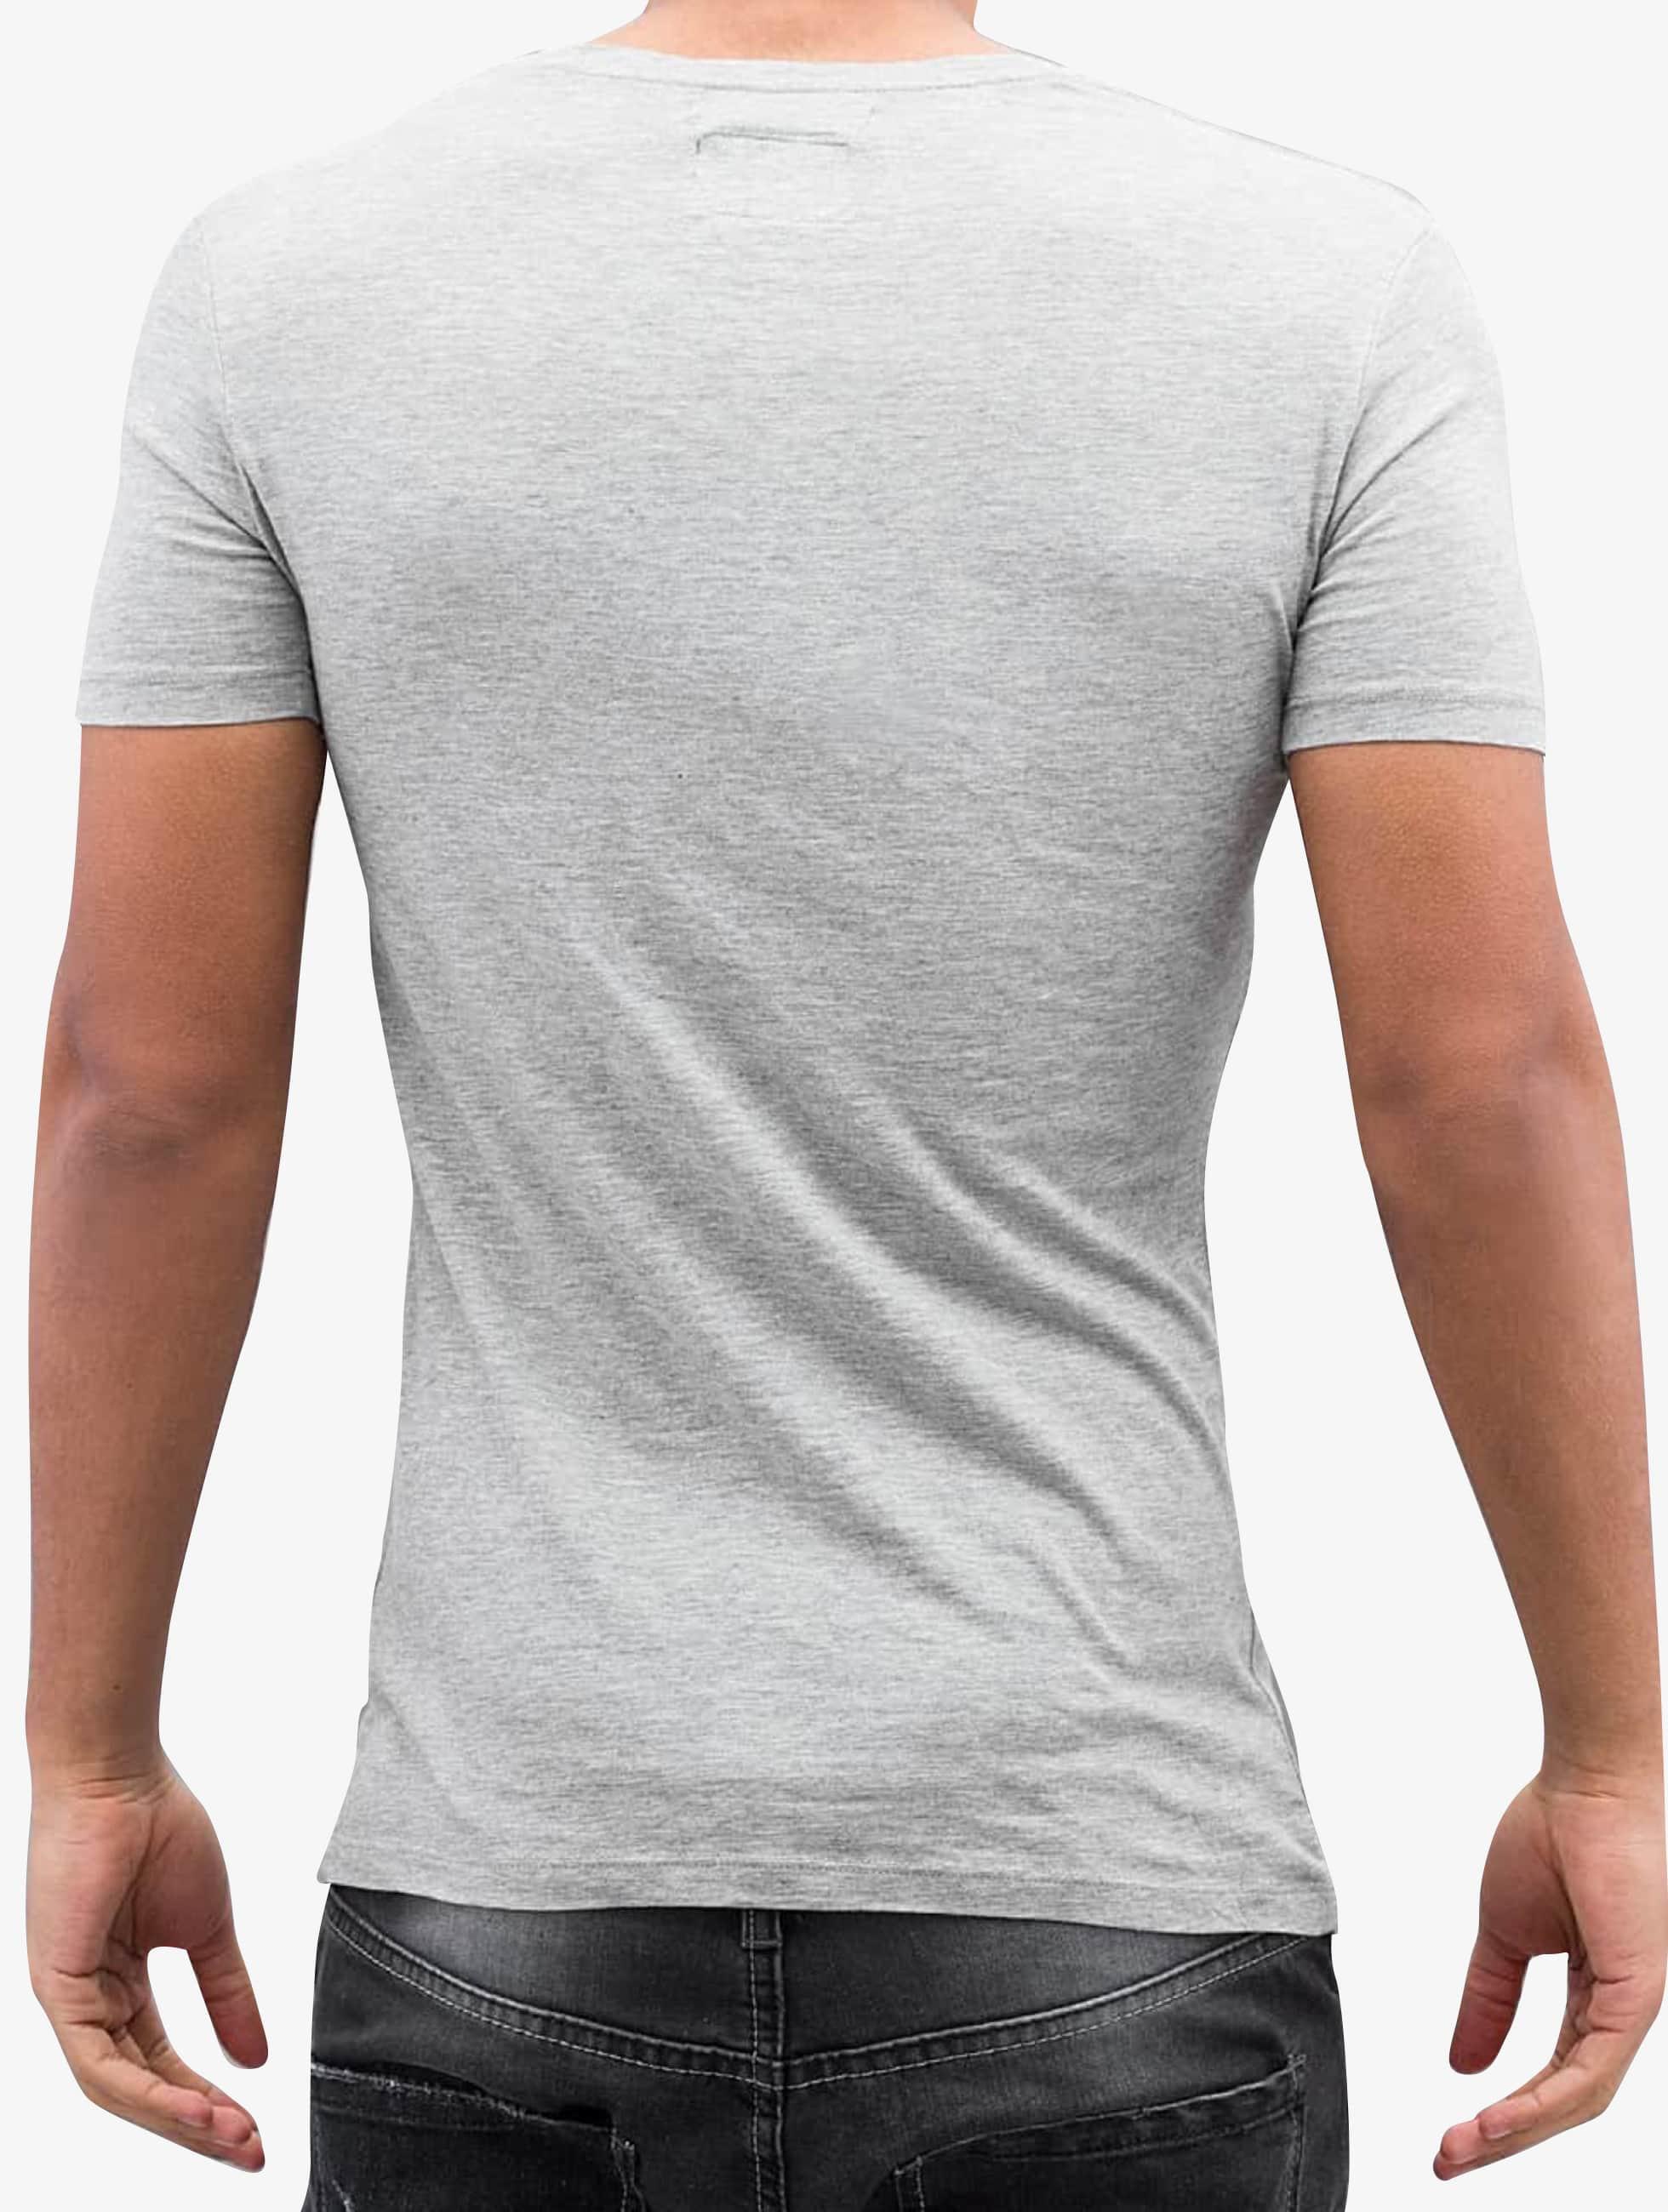 Amsterdenim T-Shirt Aad gris